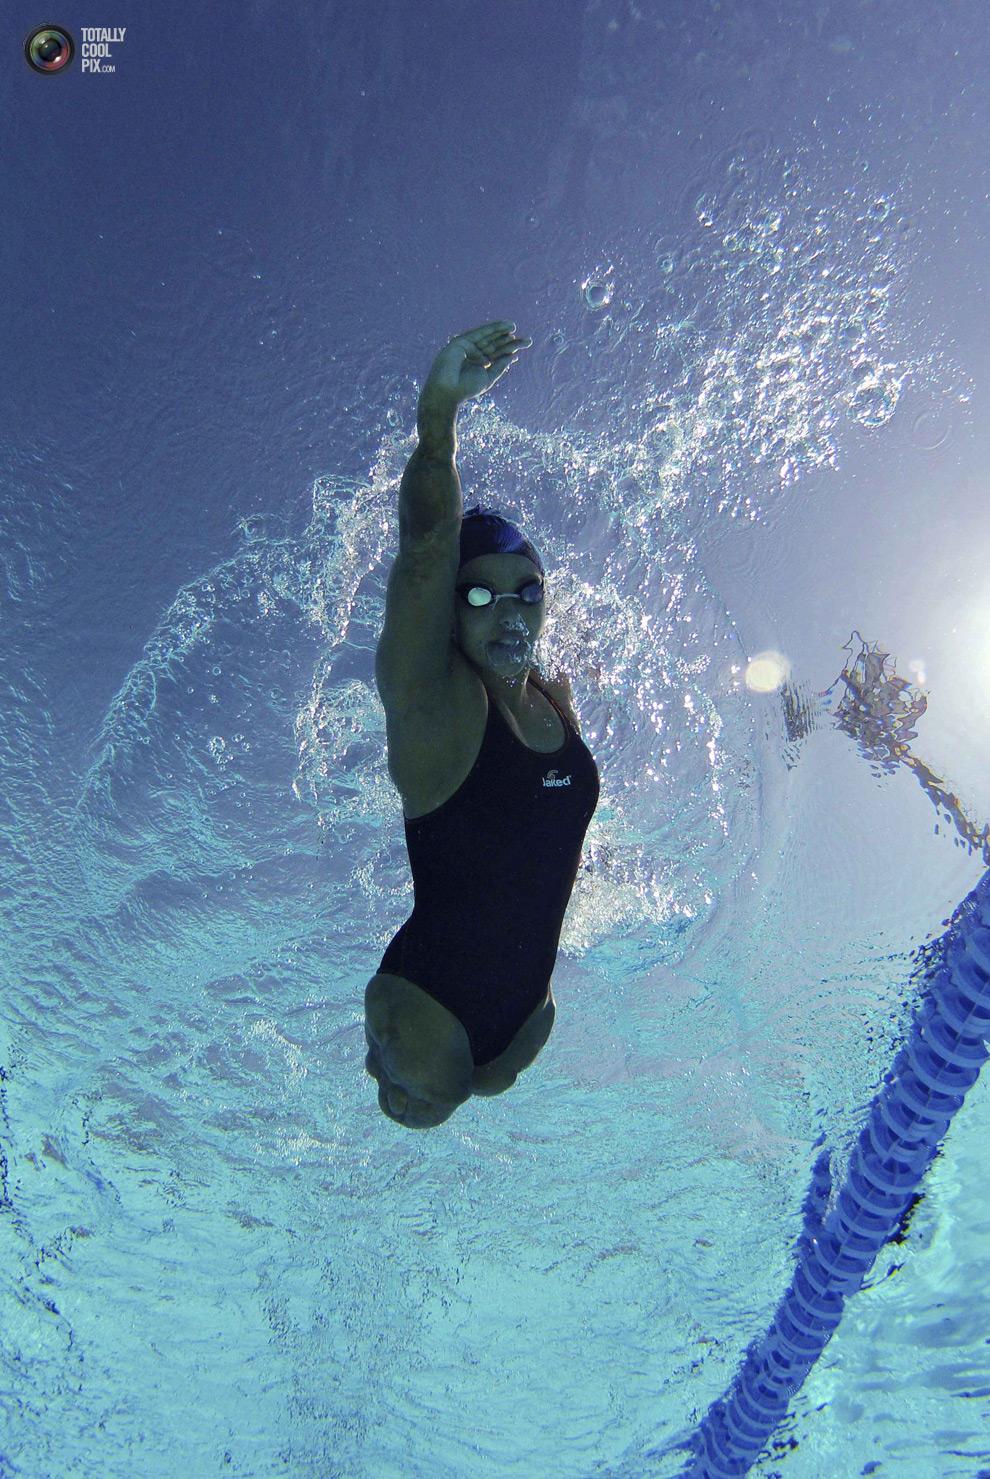 ldn2012parawimmers 011 Лондон 2012   тренировка паралимпийских пловцов